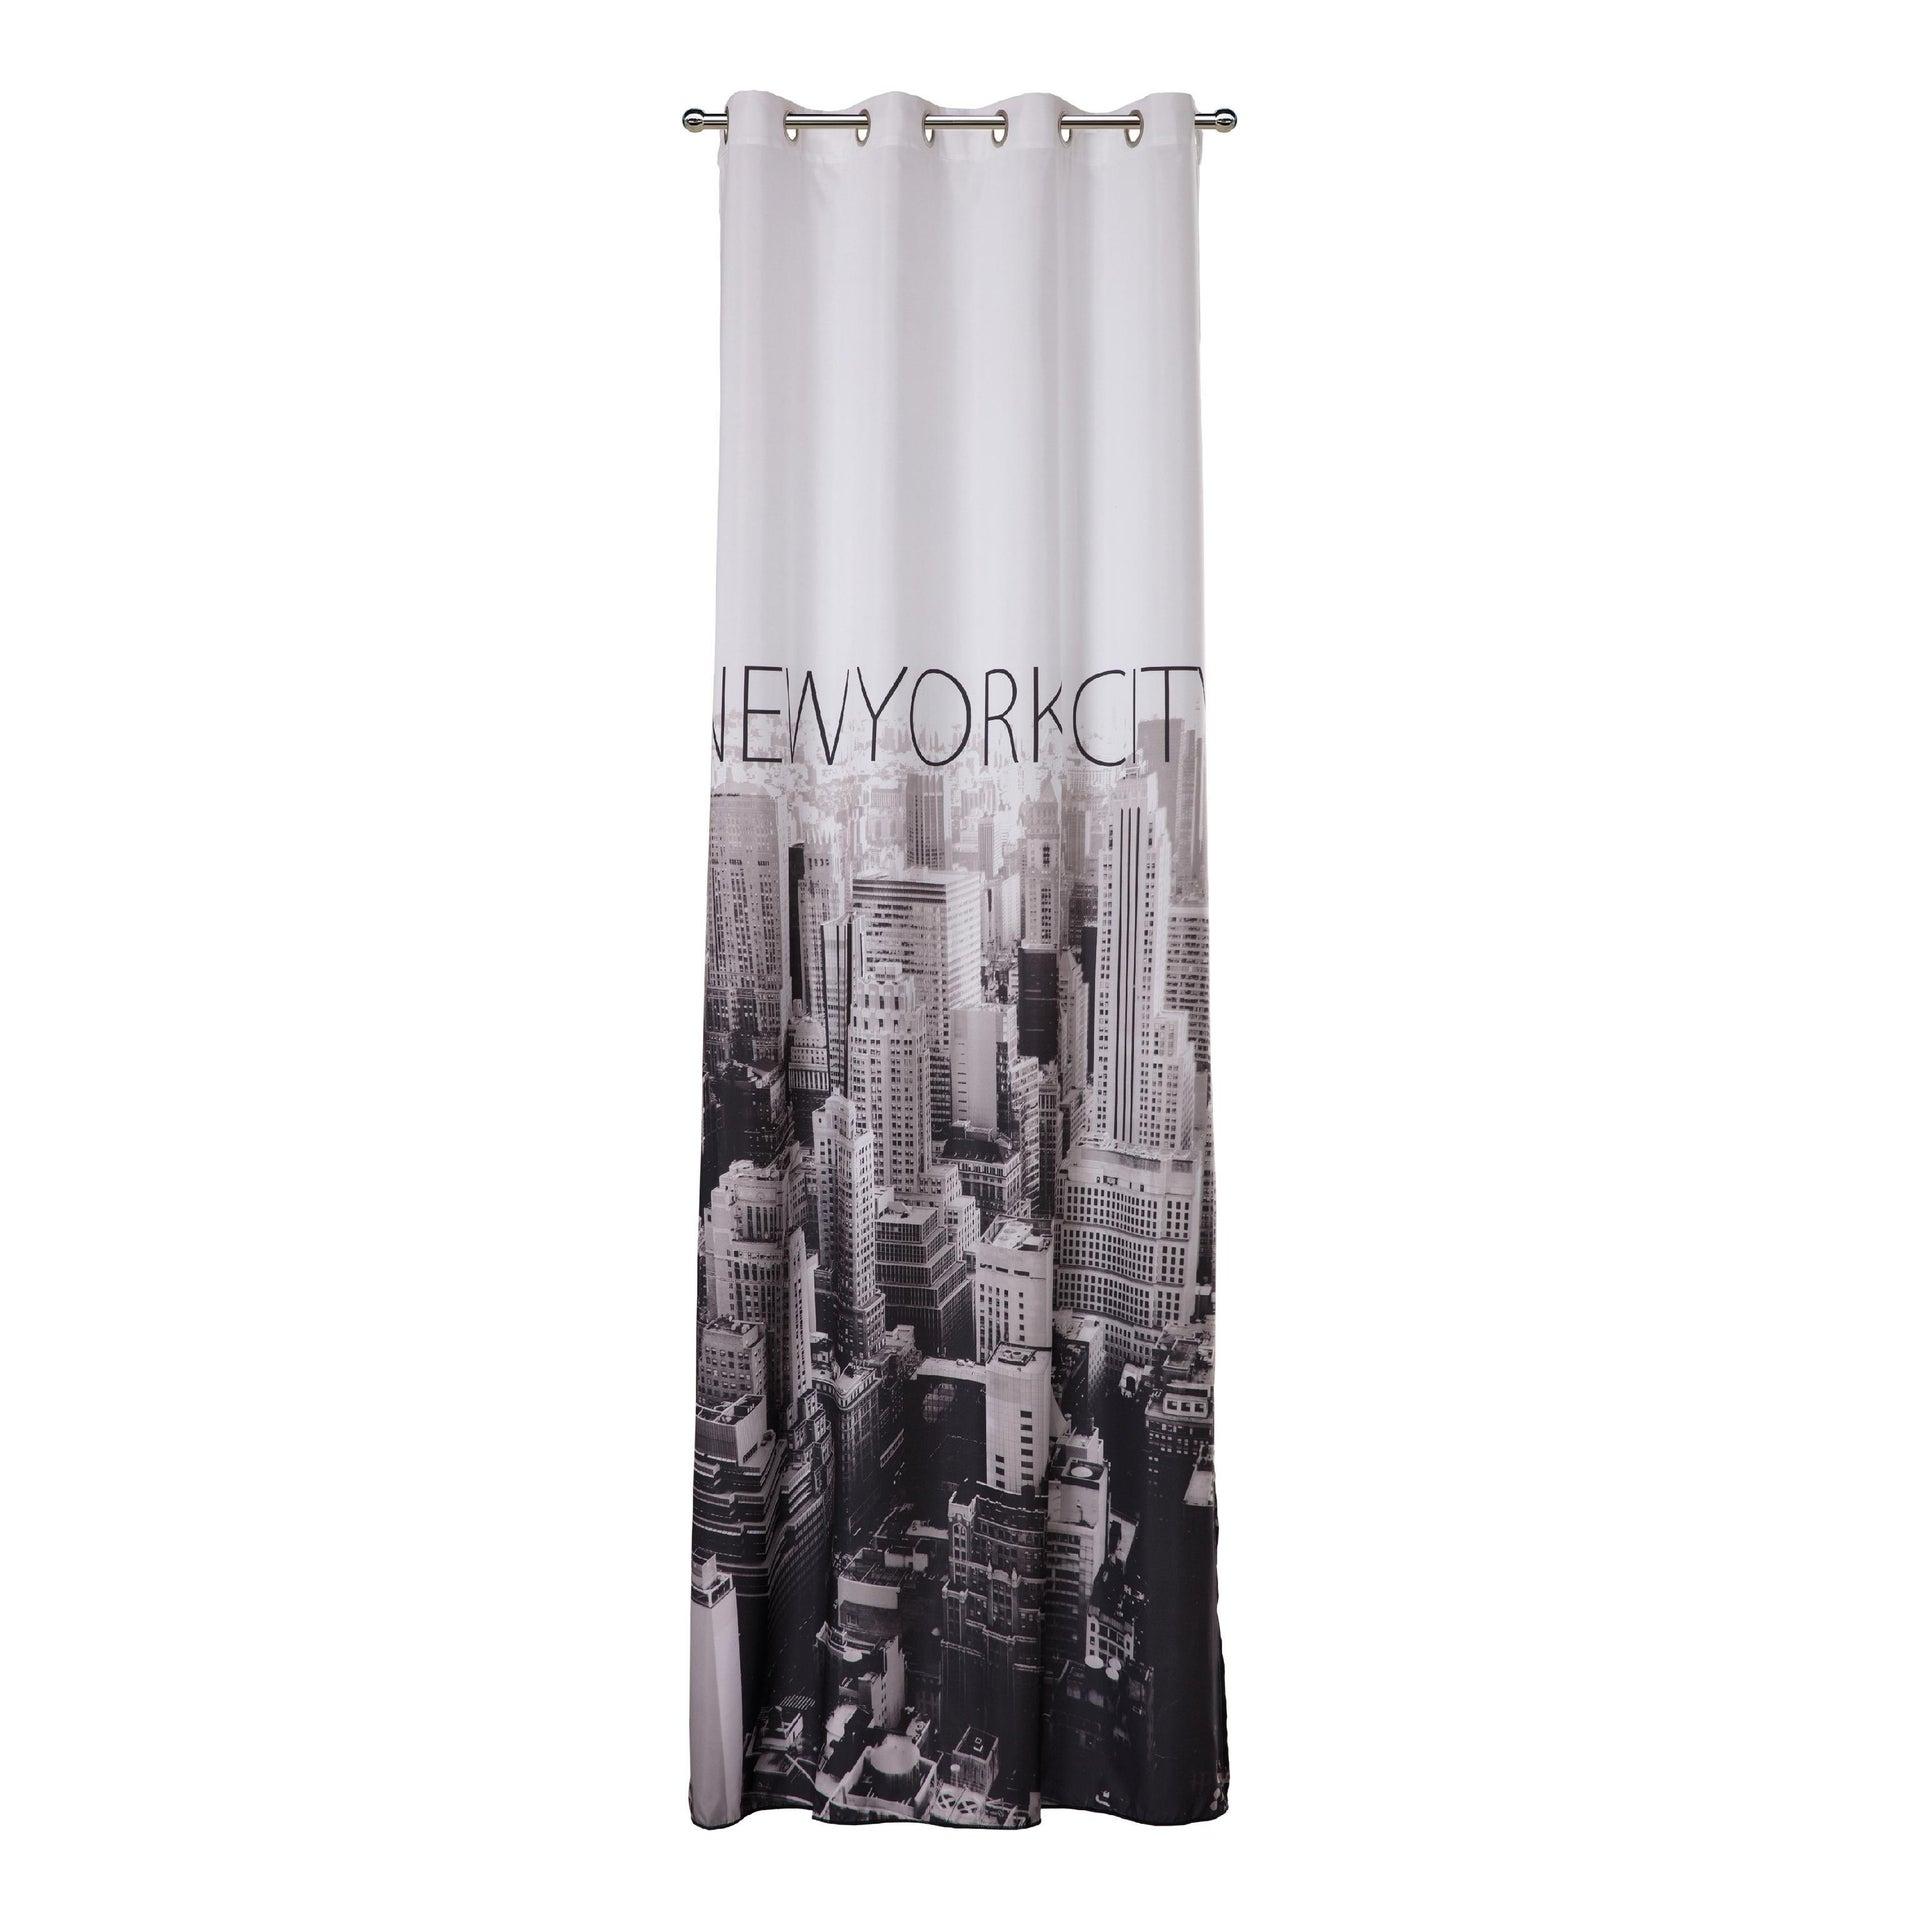 Tenda Metropolitan New York bianco e nero occhielli 140 x 280 cm - 4